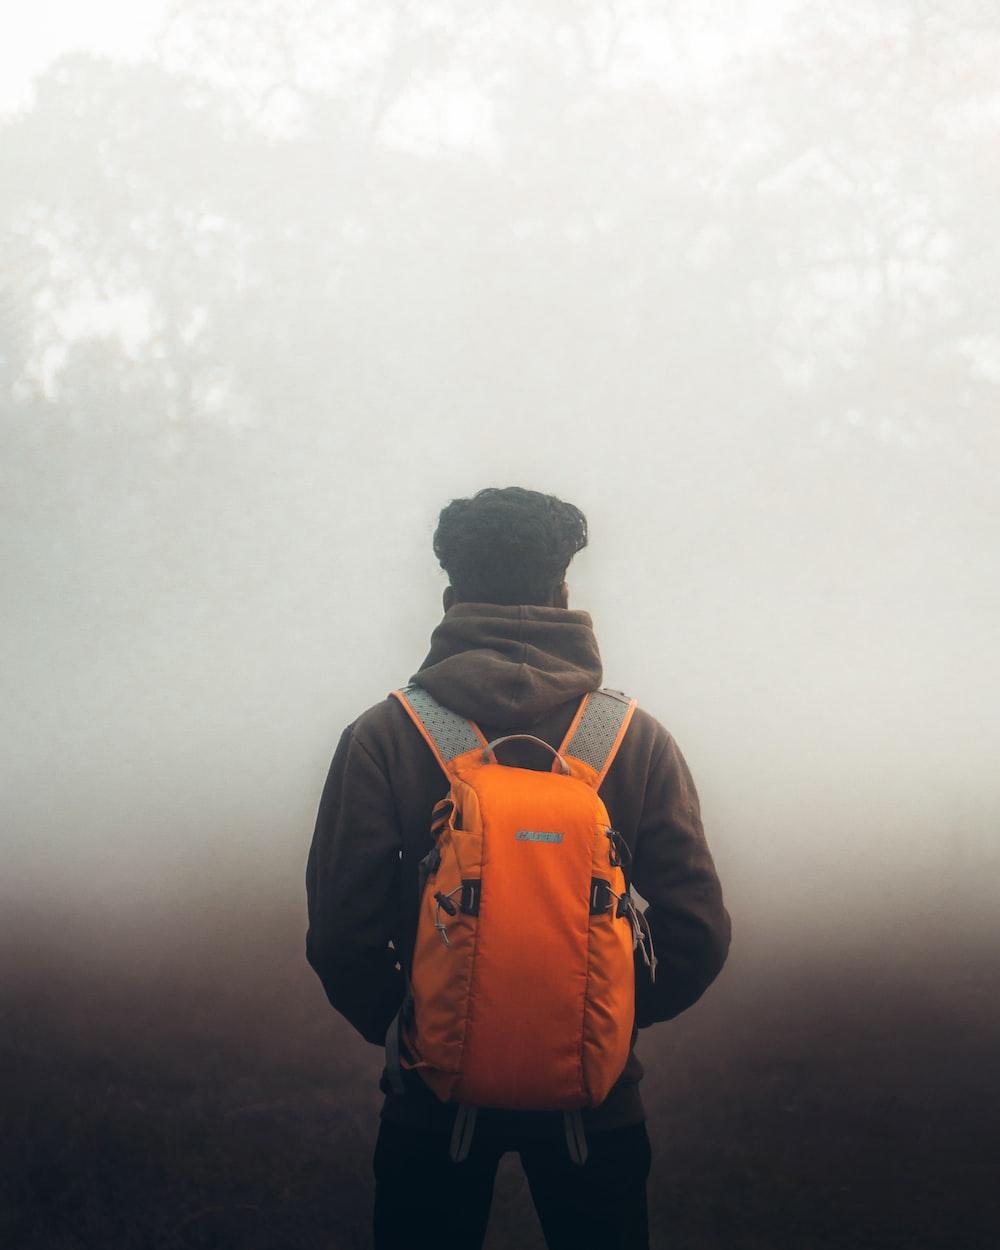 man in orange and black backpack